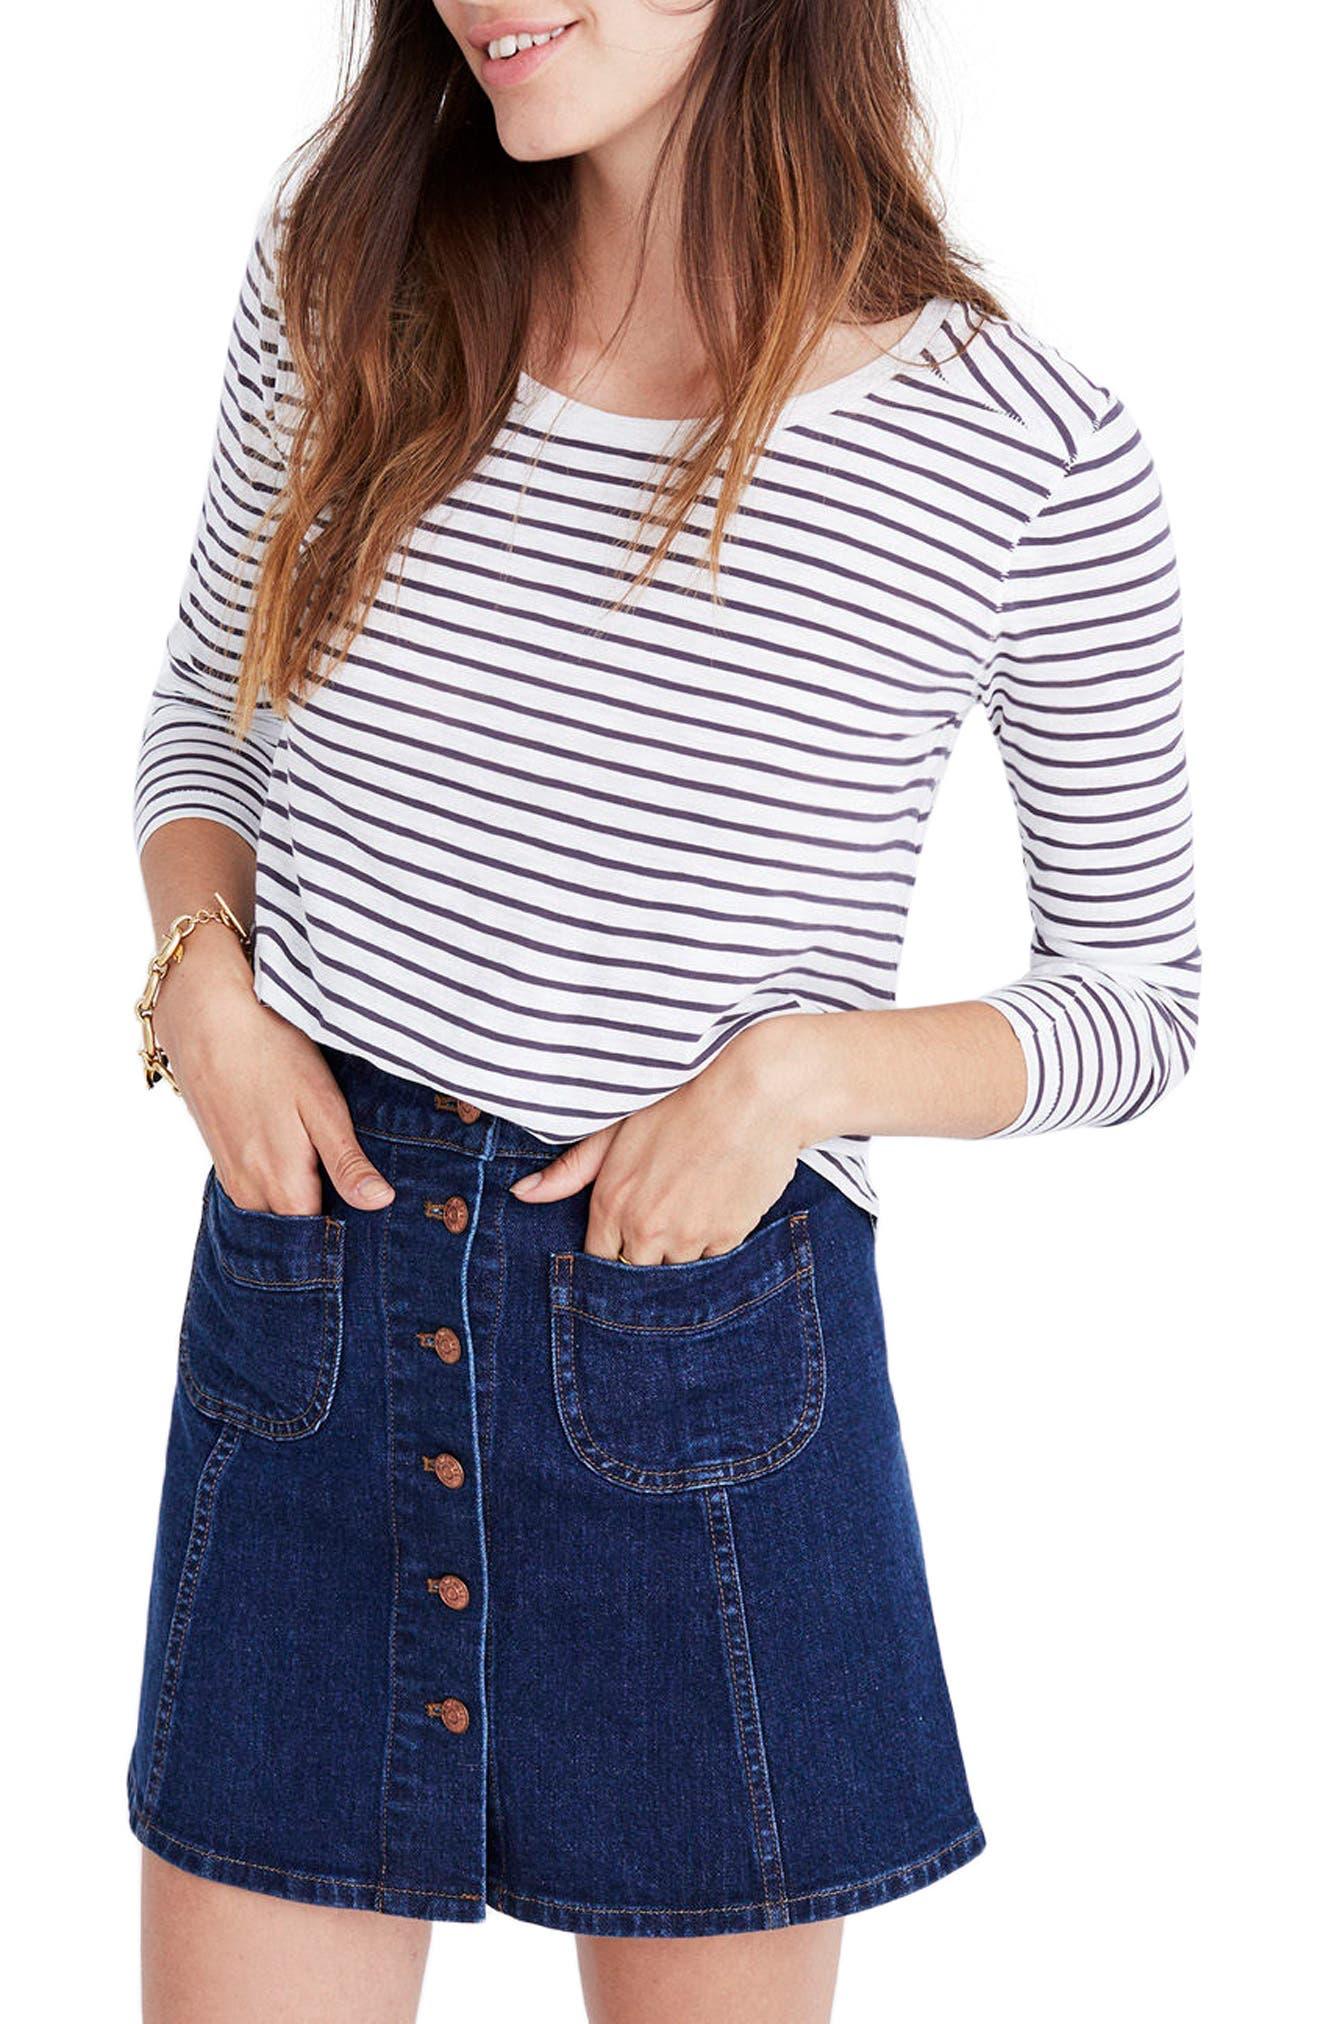 Madewell Whisper Cotton Stripe Long Sleeve Tee